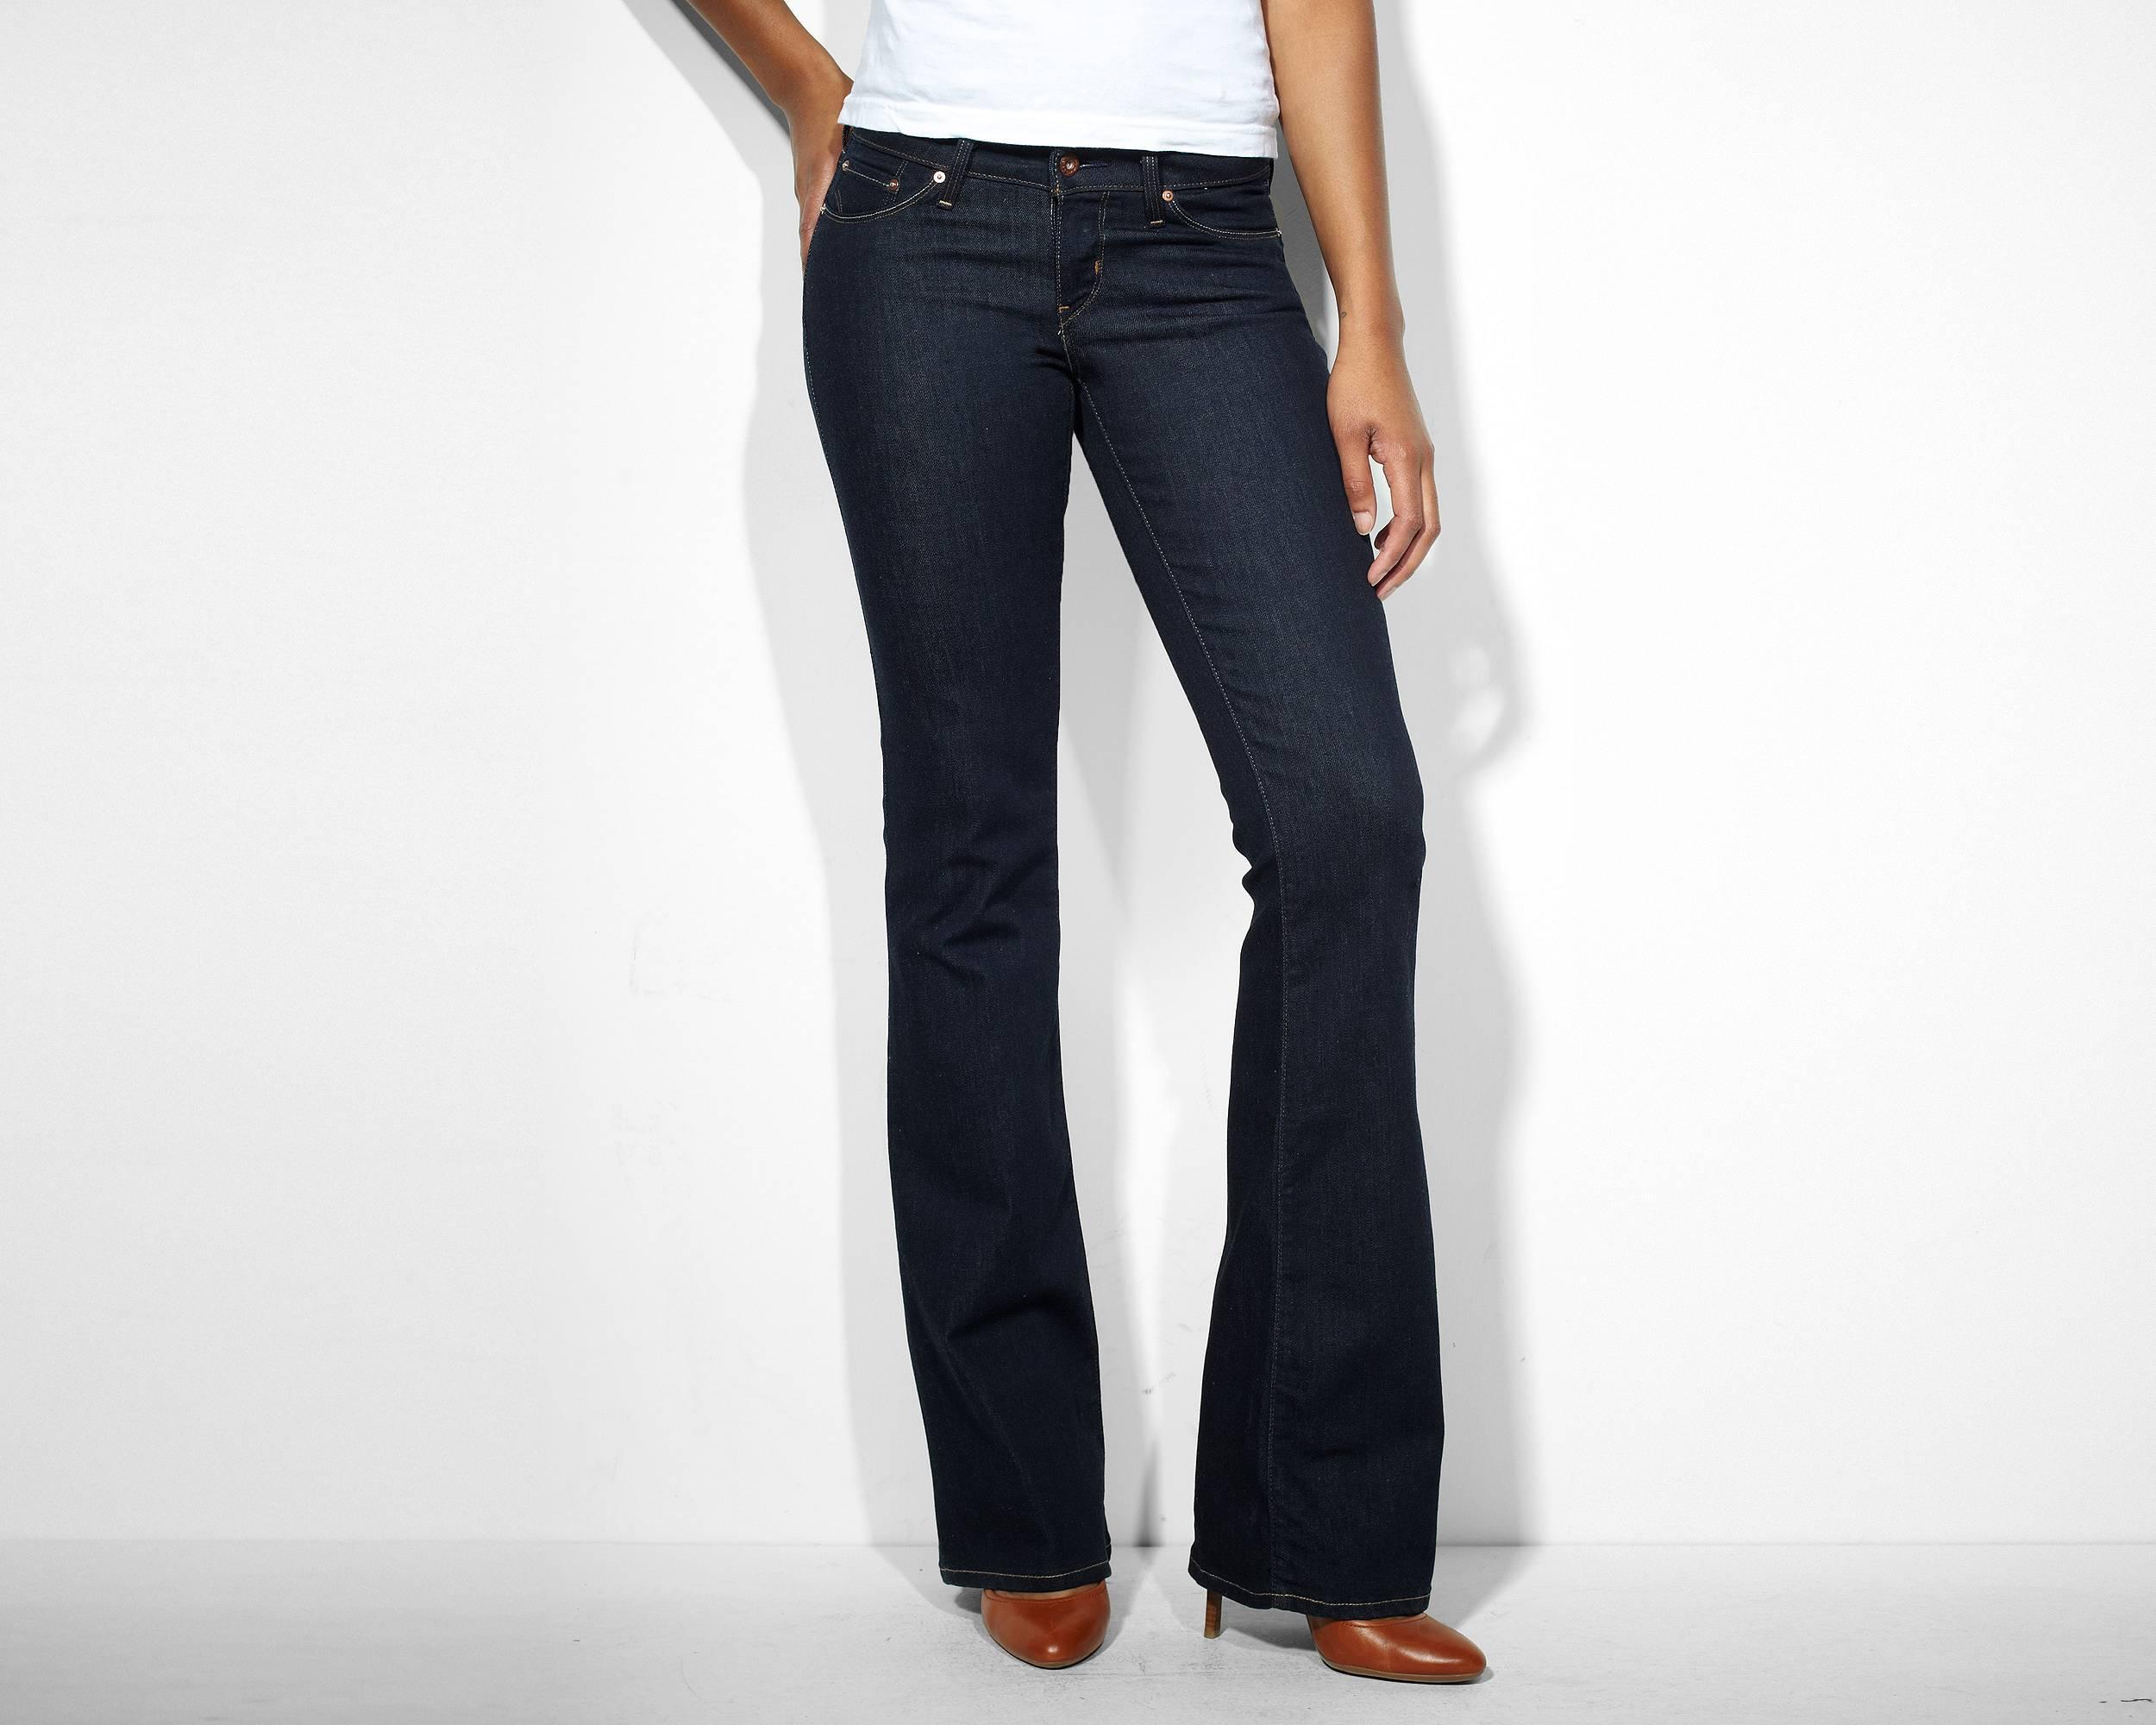 Modern Rise Bold Curve Flare Jeans | Richest Indigo |Levi's ...